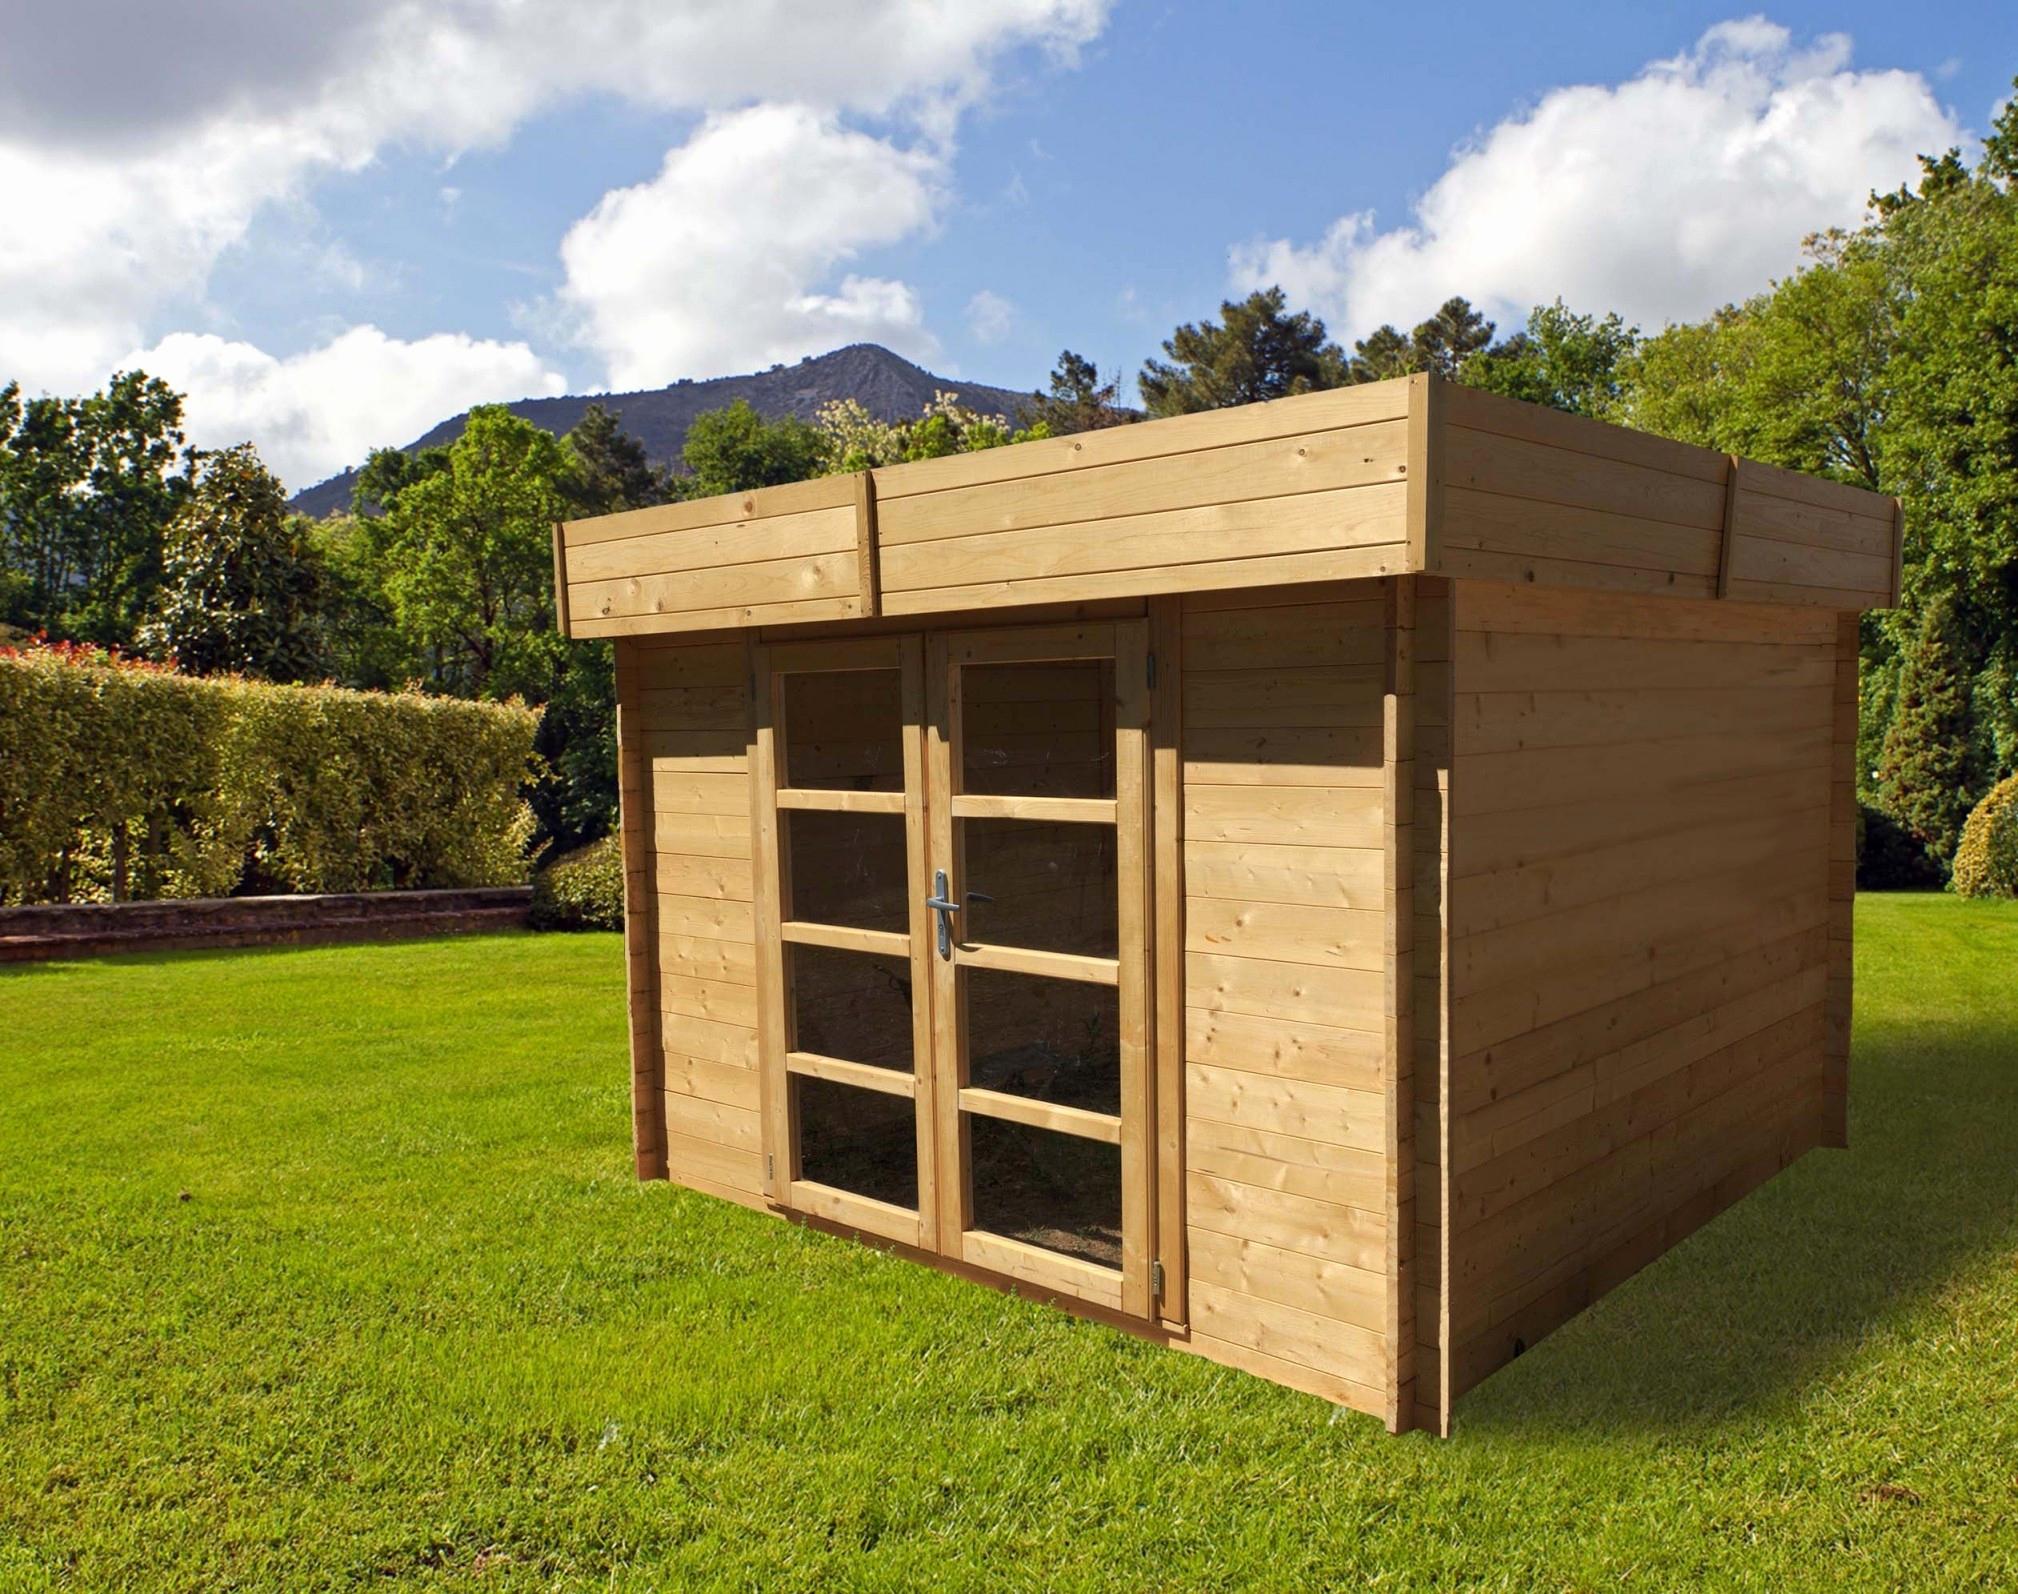 catalogue la foirfouille meilleur de image salon de jardin resine foir fouille. Black Bedroom Furniture Sets. Home Design Ideas